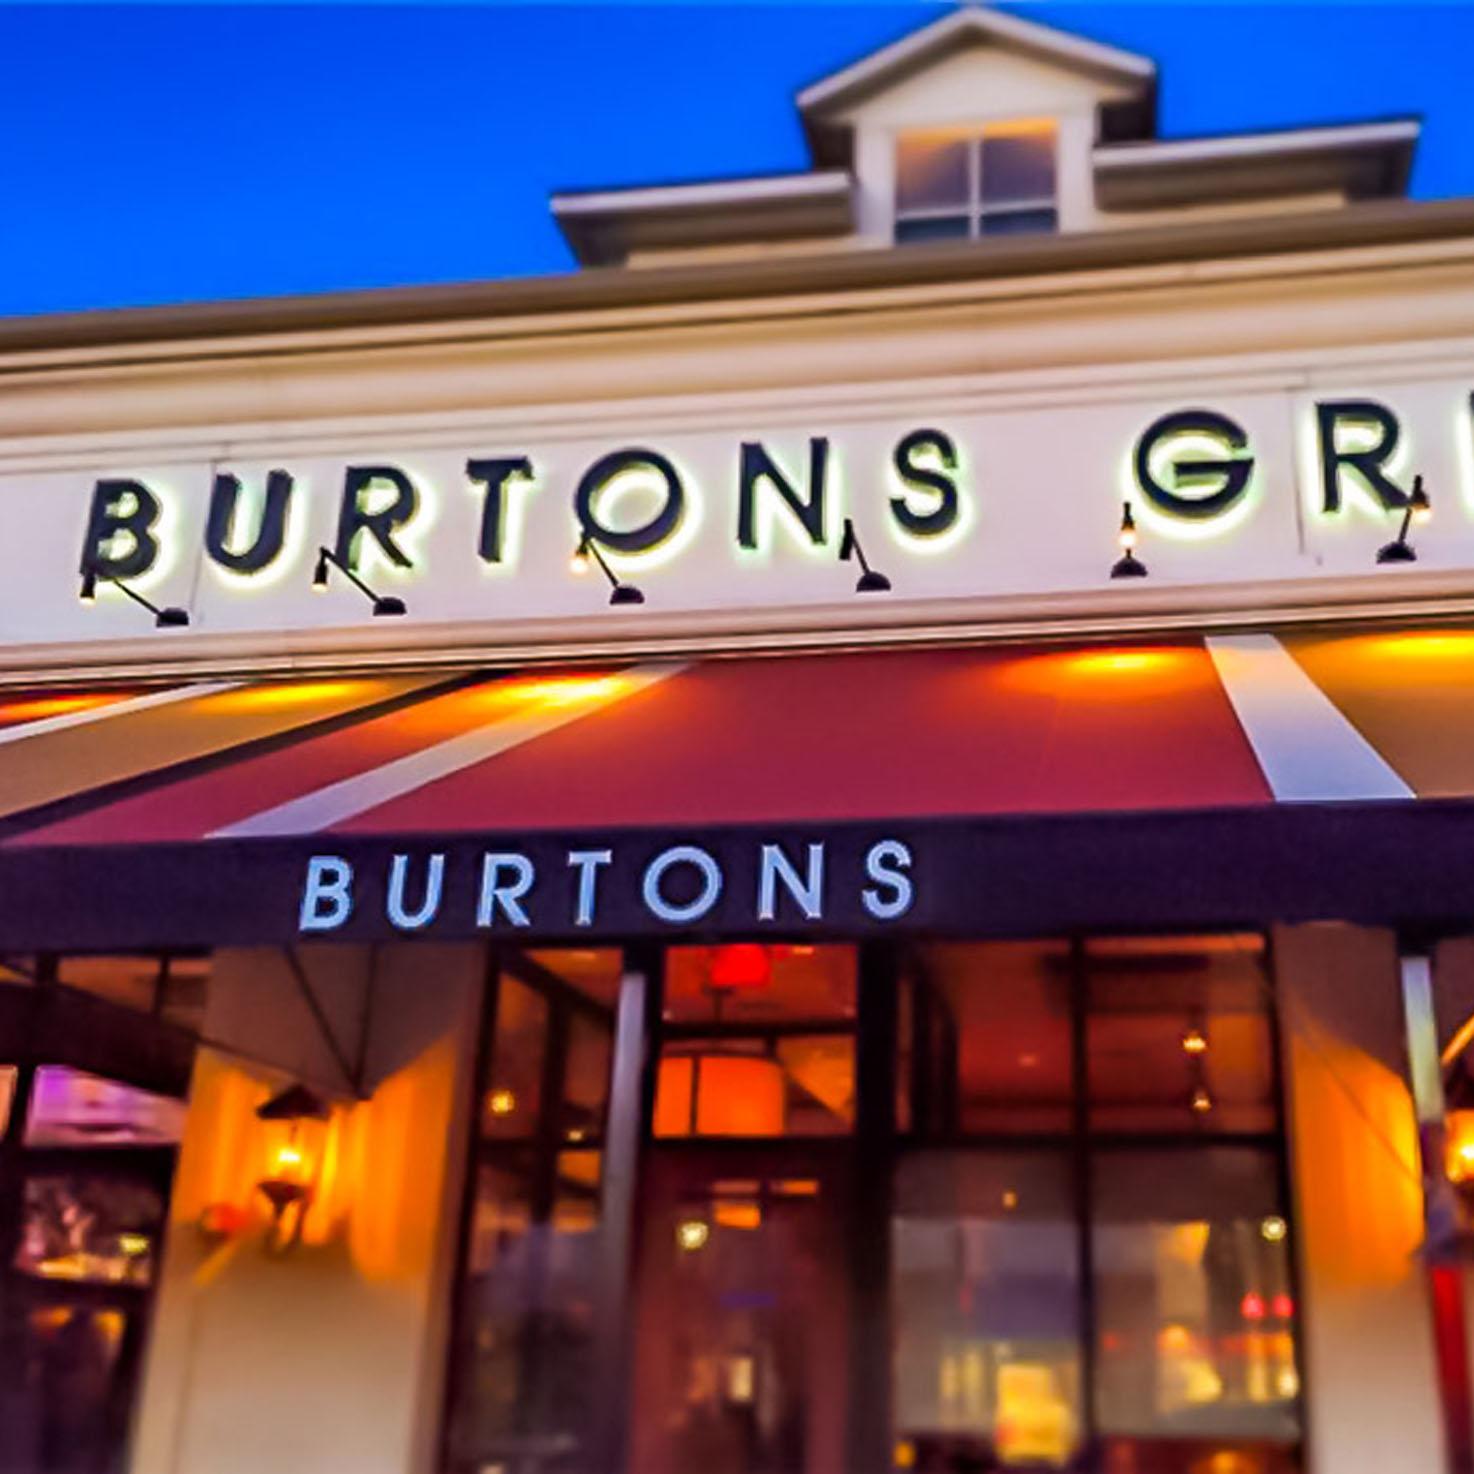 Manchester   Burtons Grill   Burtons Grill